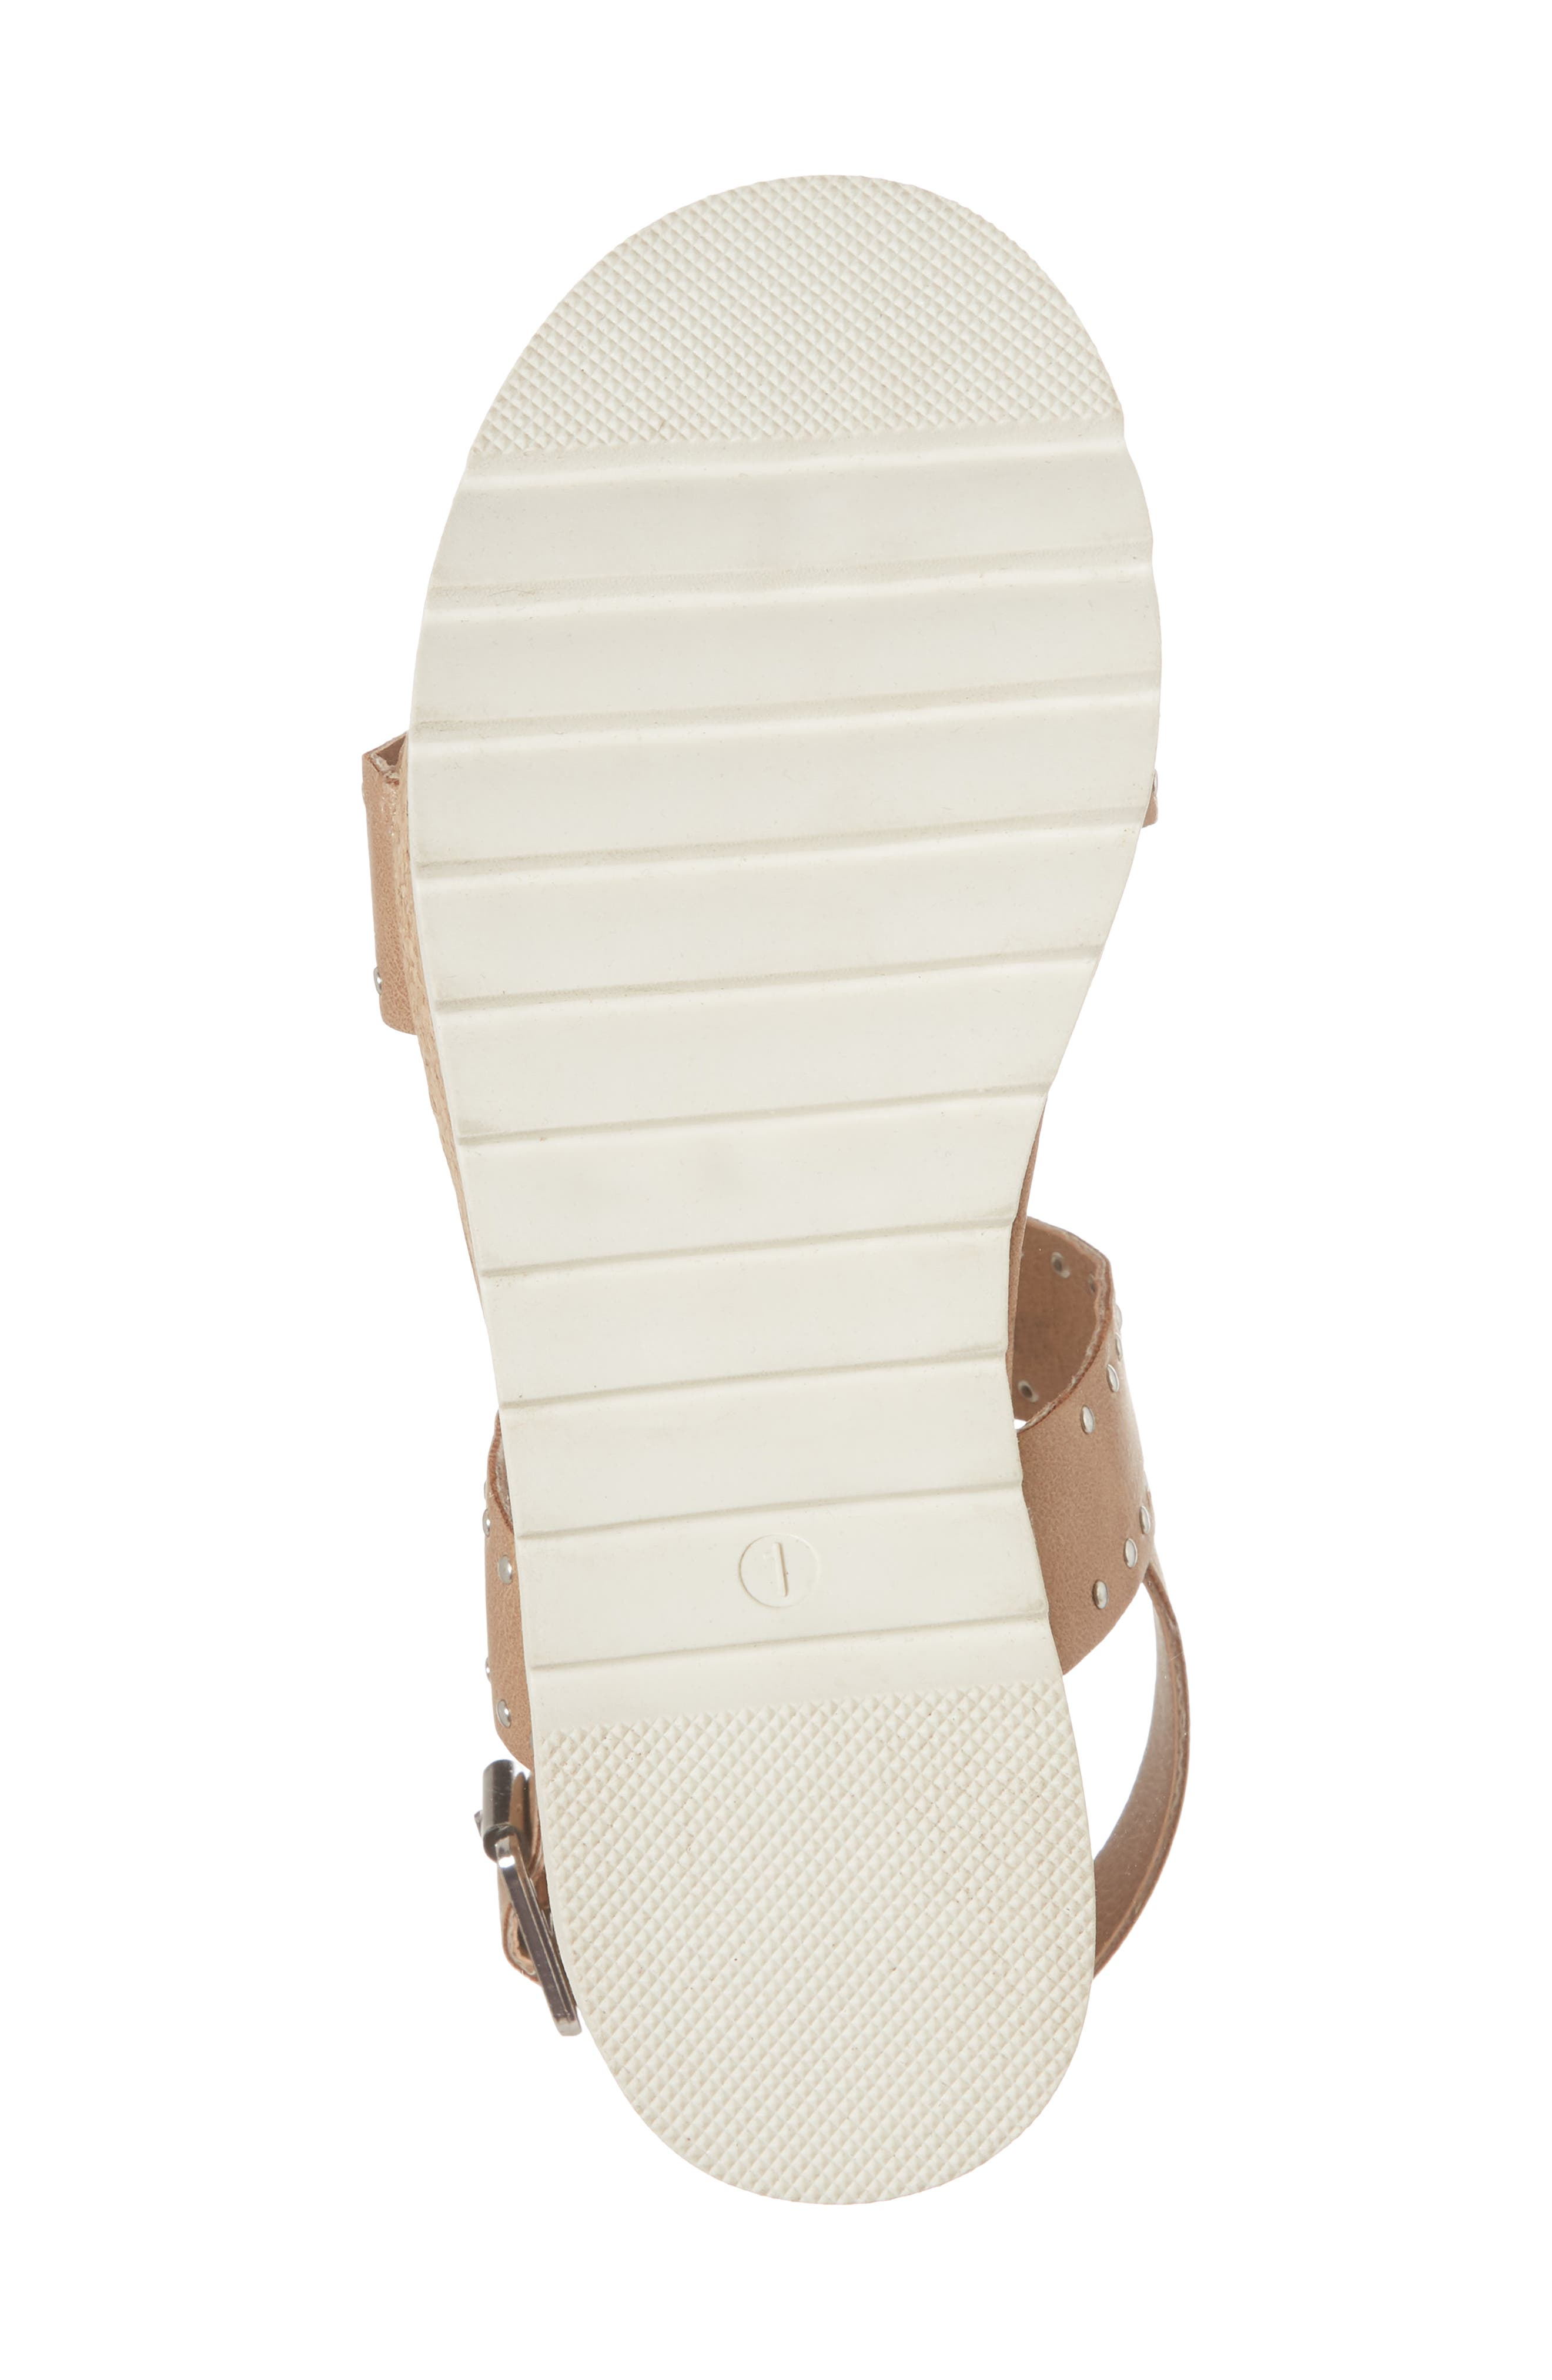 JKRISTIE Platform Sandal,                             Alternate thumbnail 6, color,                             Natural